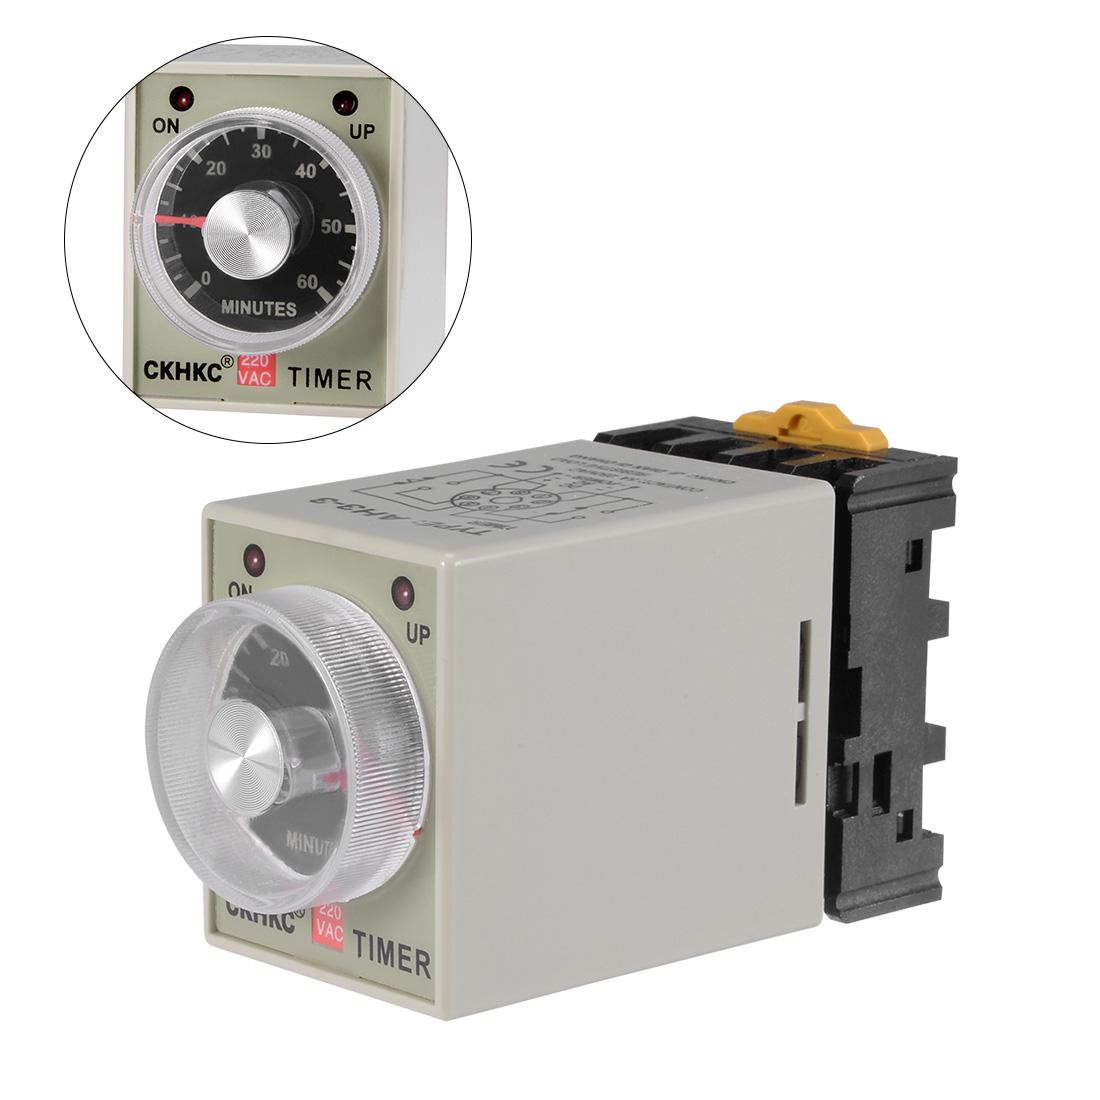 AC220V 60M 8 Terminals Range Adjustable Delay Timer Time Relay AH3-3 w base